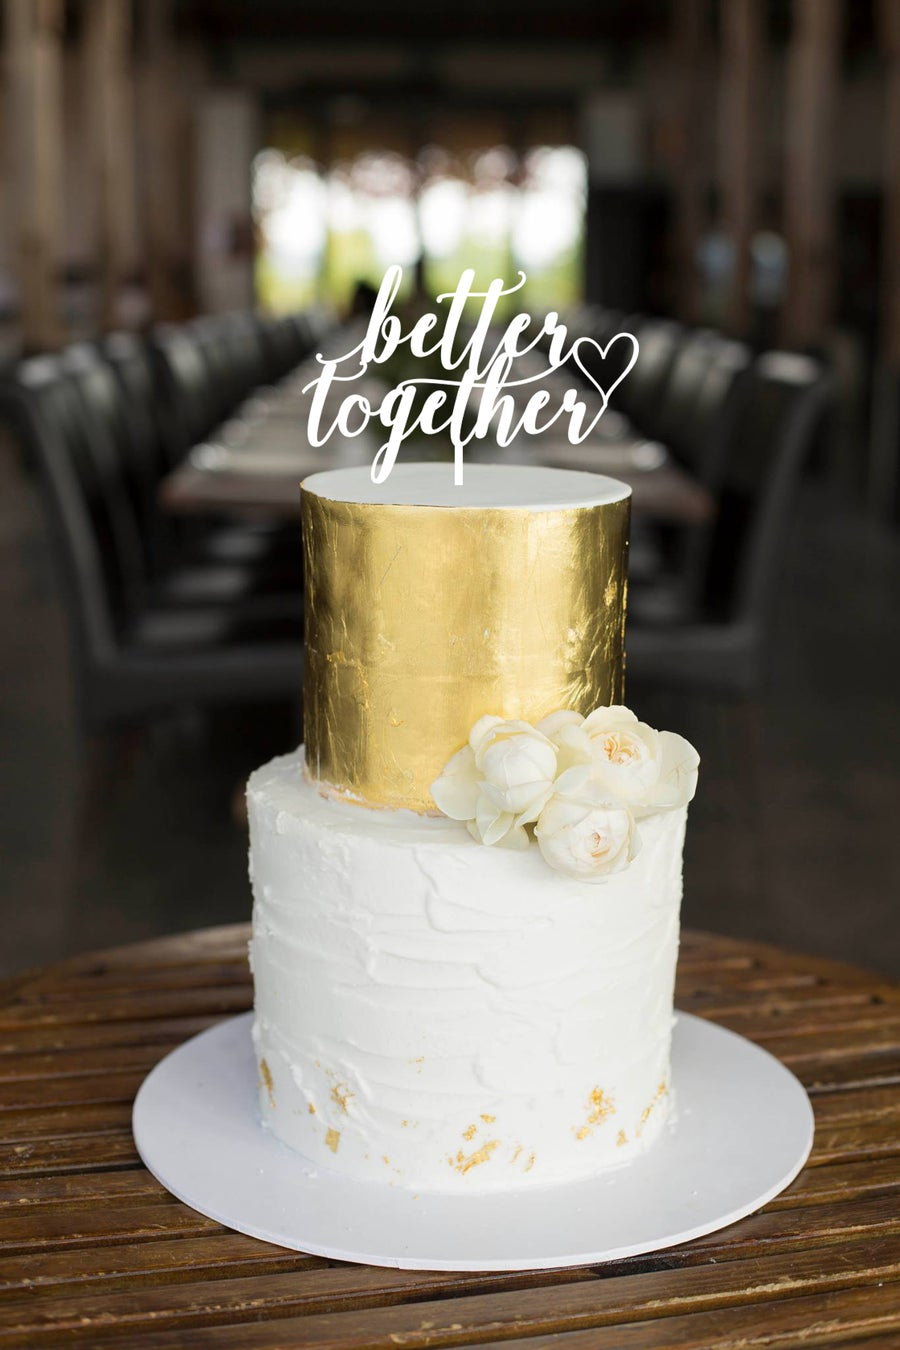 Image of Better Together